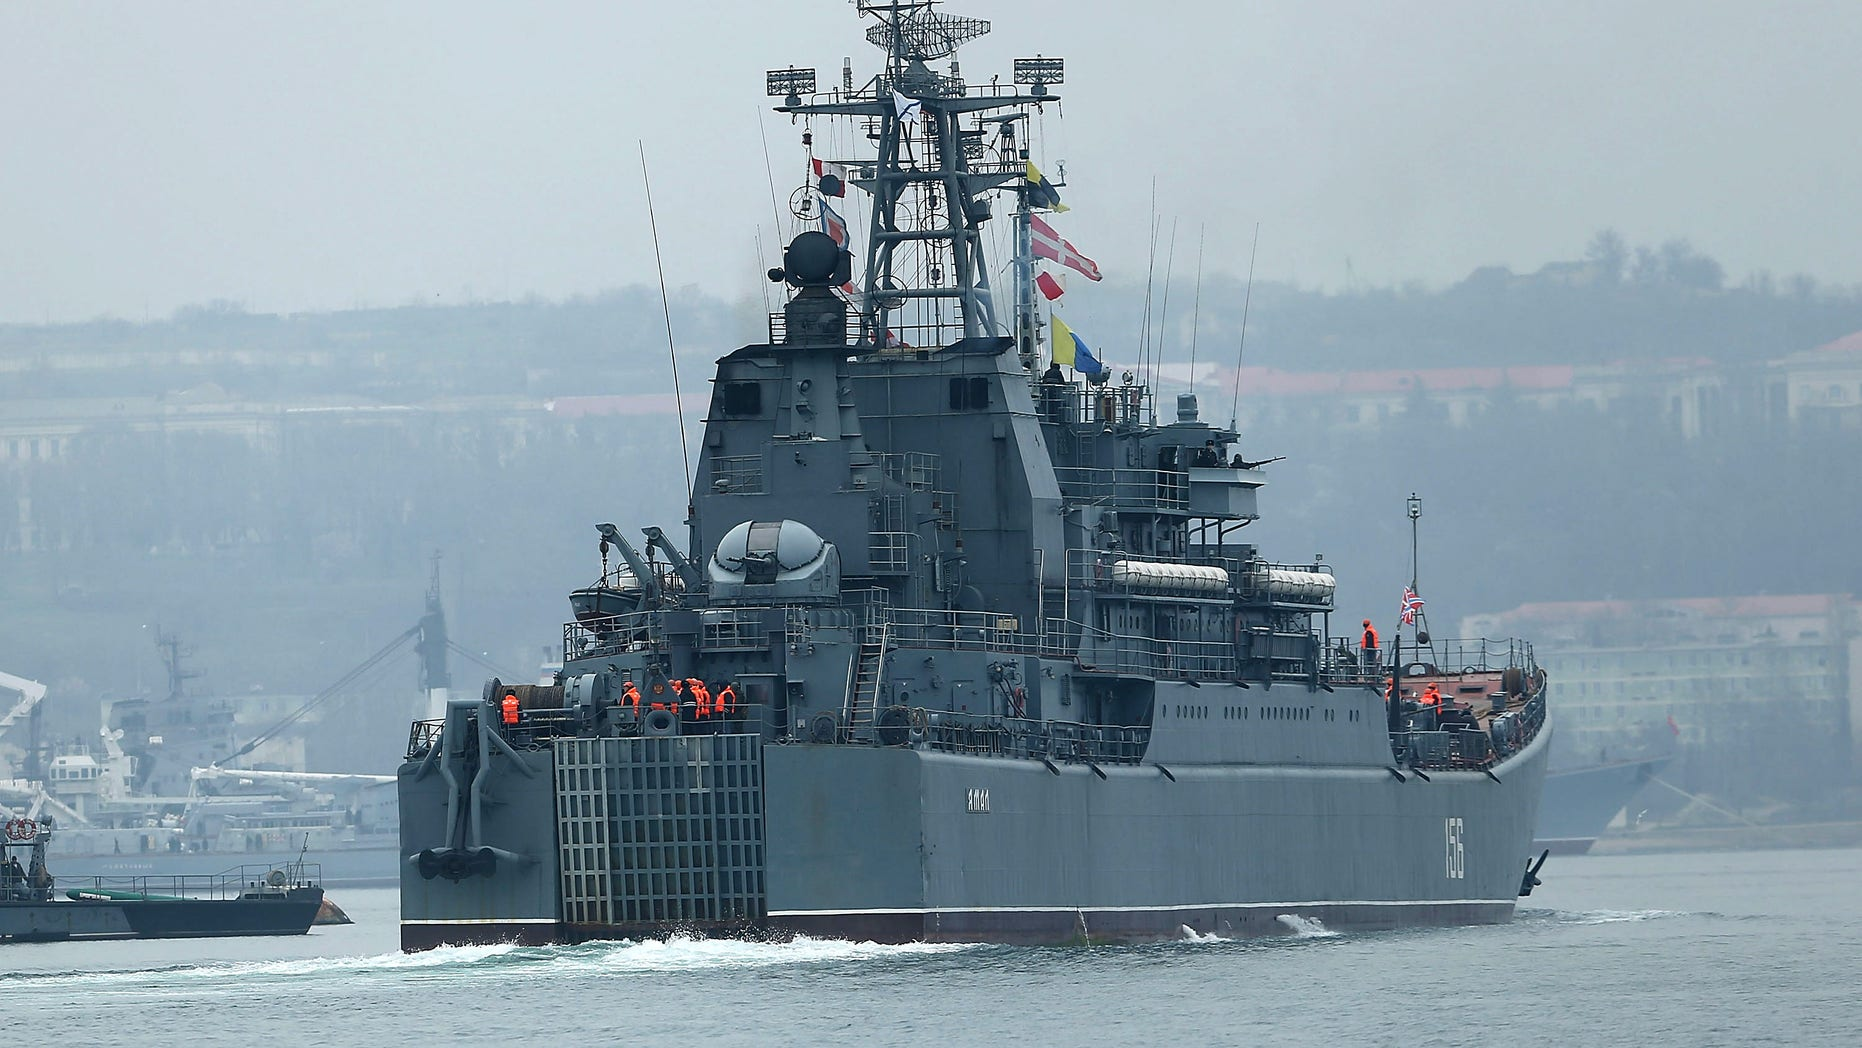 A Russian warship is viewed in Sevastopol harbor on March 7, 2014 in Sevastopol, Ukraine.